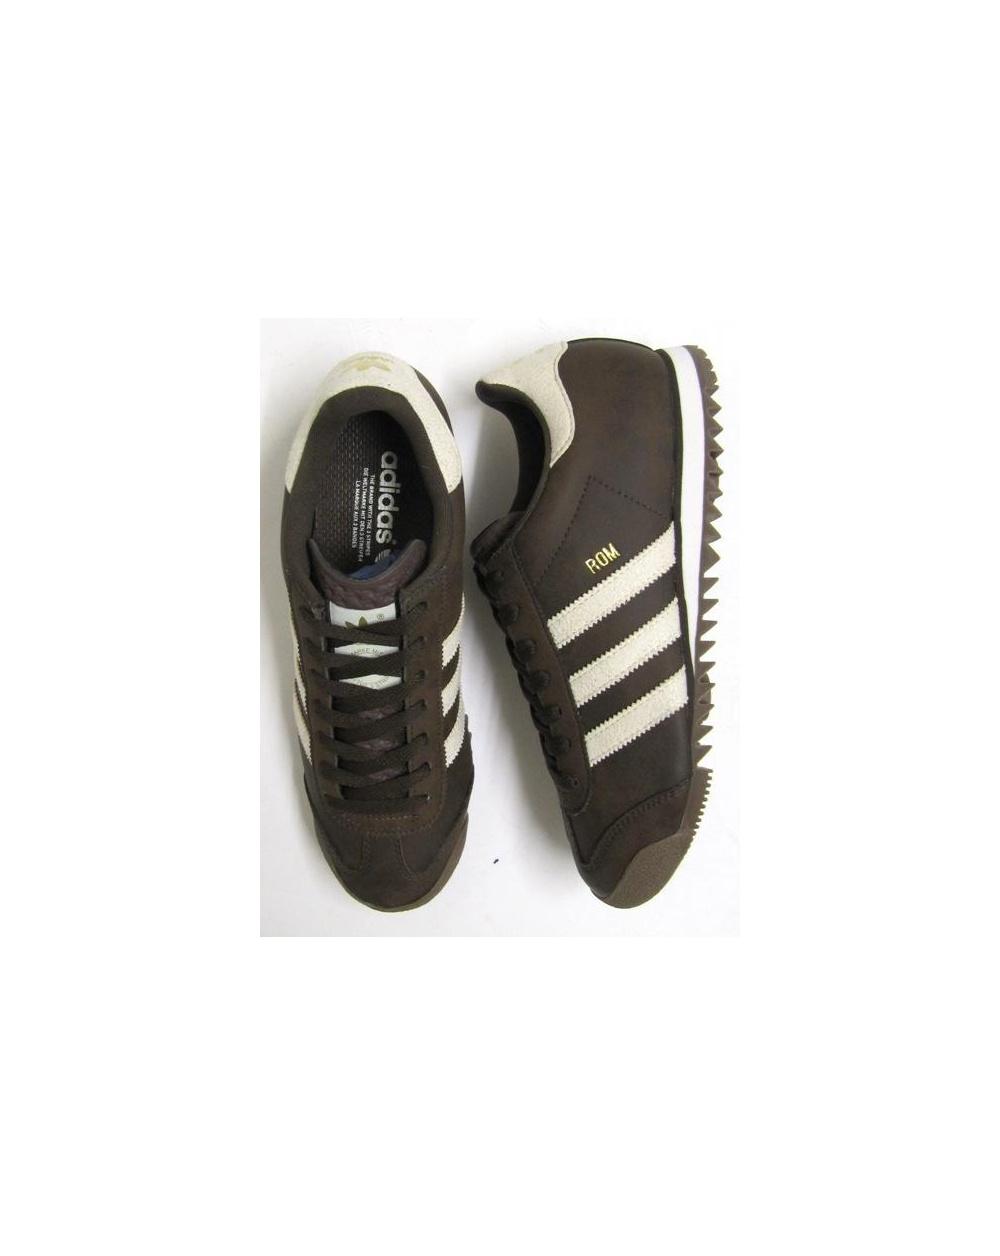 ec2873558f2 Adidas ROM Trainers Brown Cream